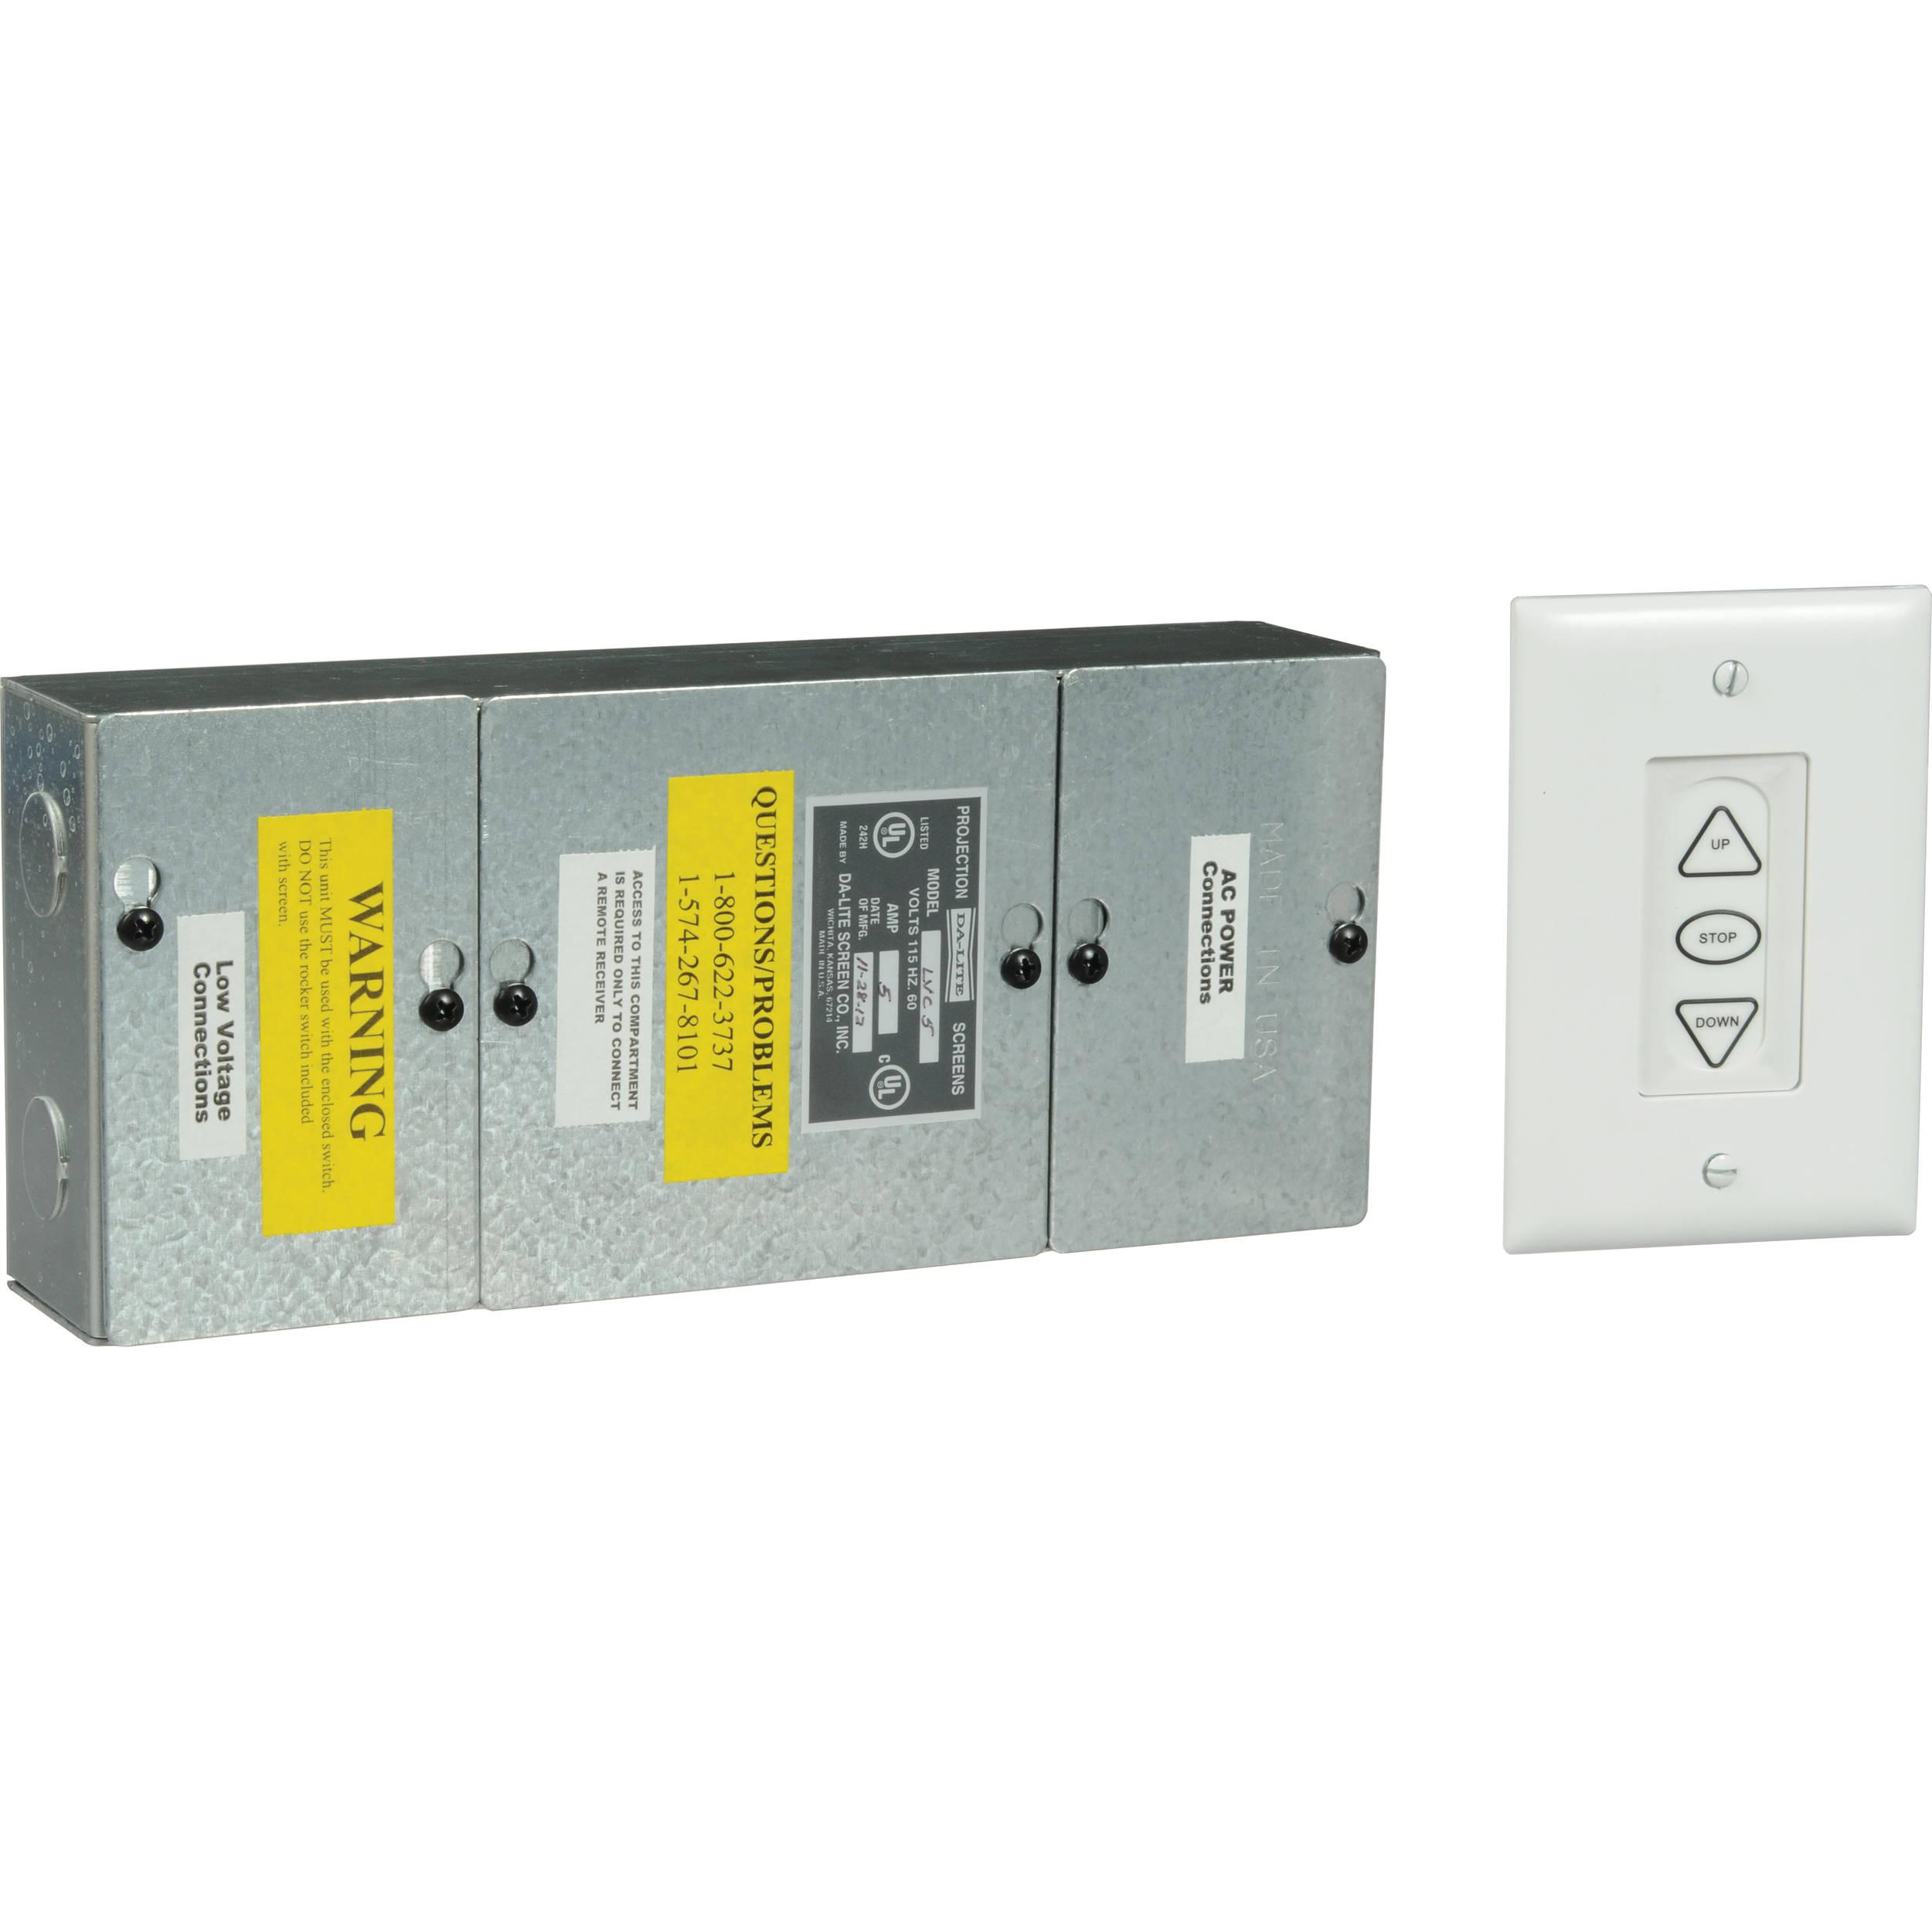 Da Lite Single Motor Low Voltage Control System 40973 B H